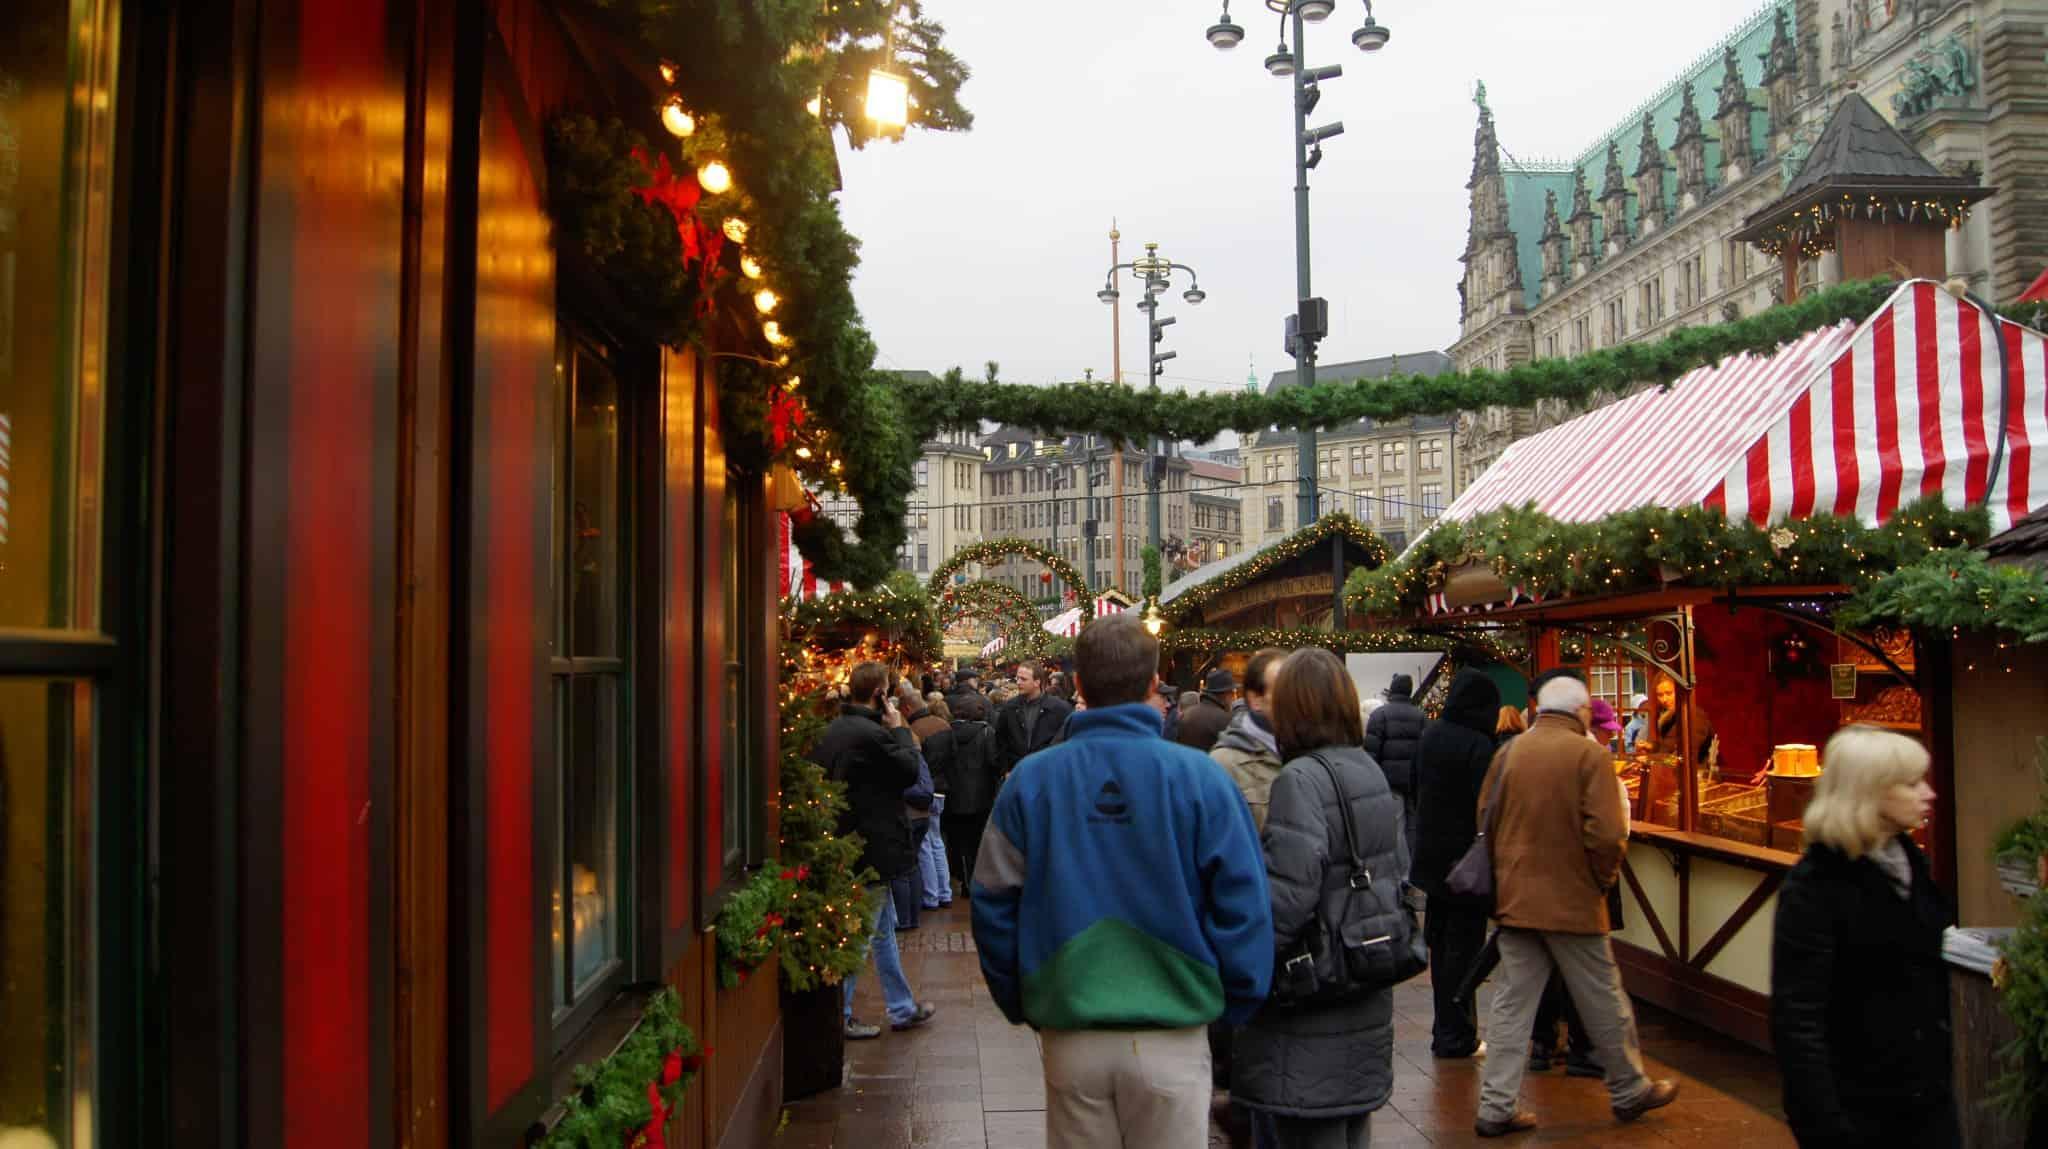 Hamburg's biggest Christmas market